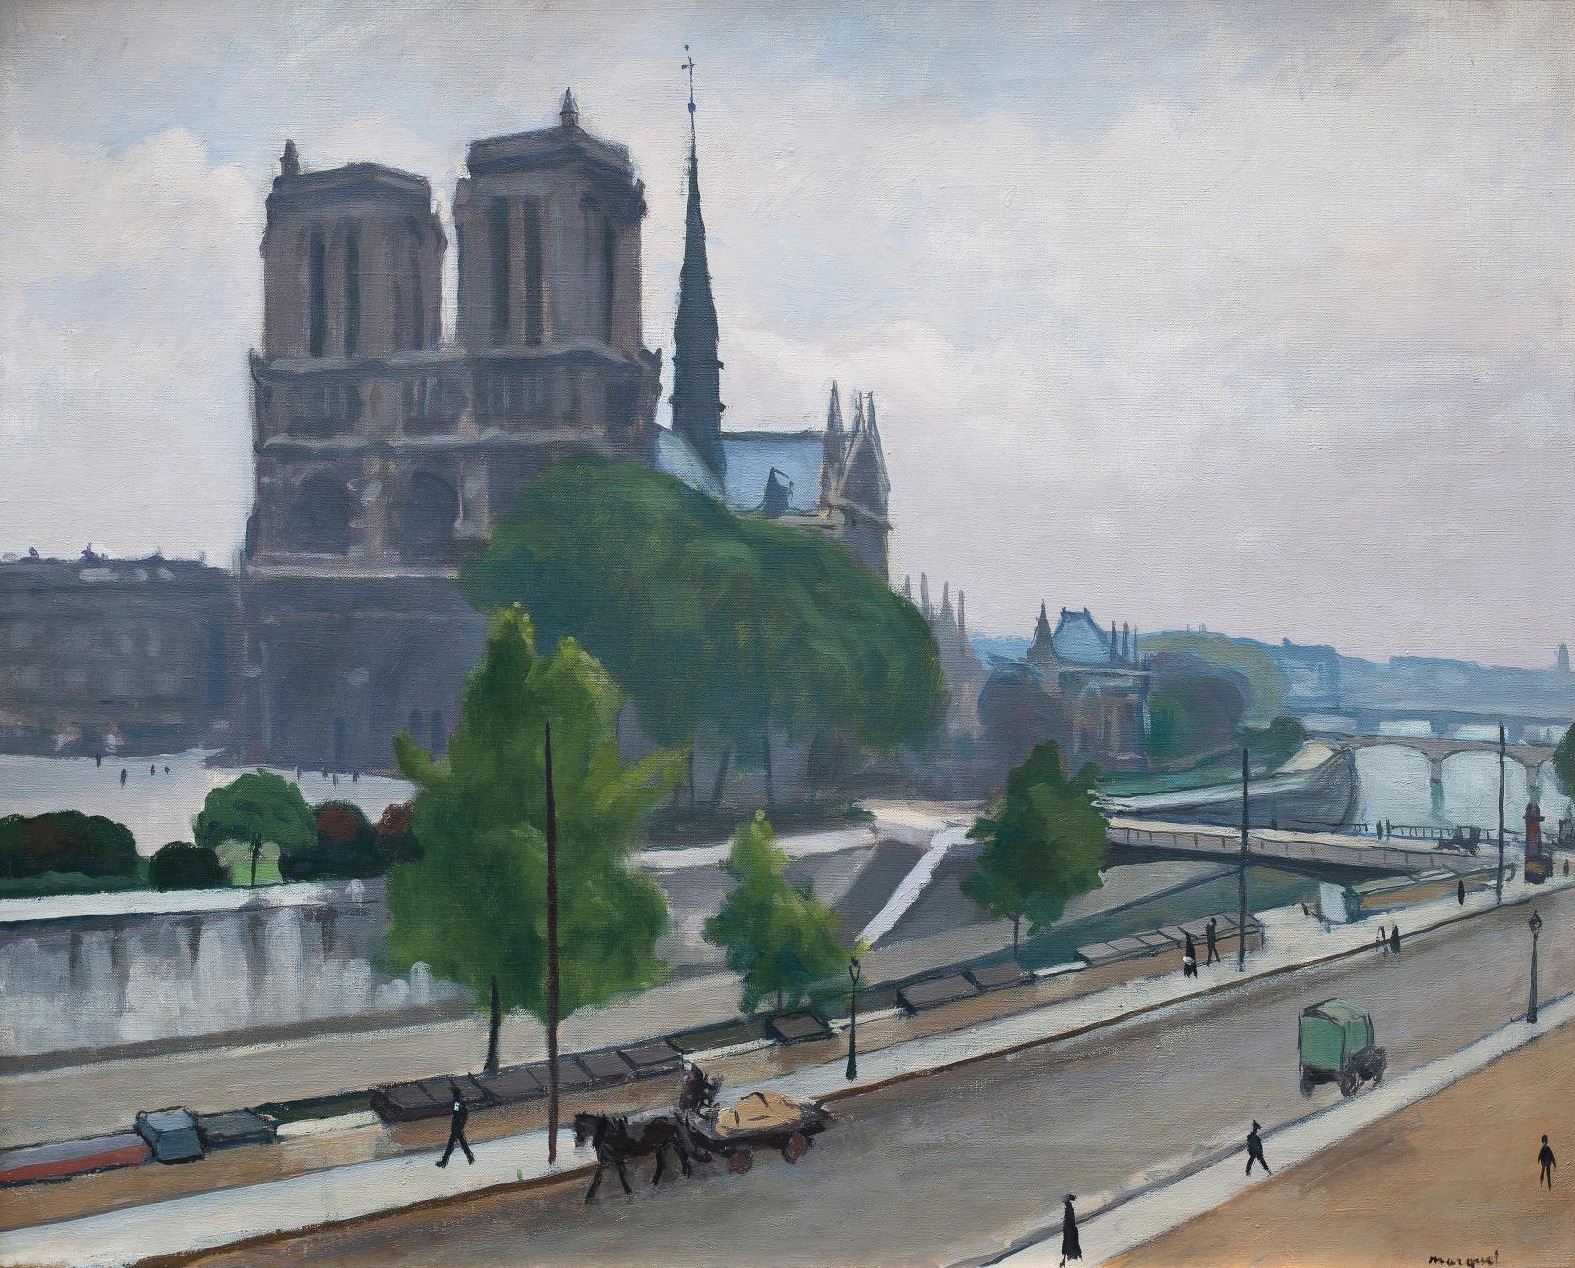 Albert Marquet (1875-1947), Notre Dame, 1922, oil on canvas, 68 x 81 cm/26.7 x 31.9 in.Estimate: €120,000/180,000